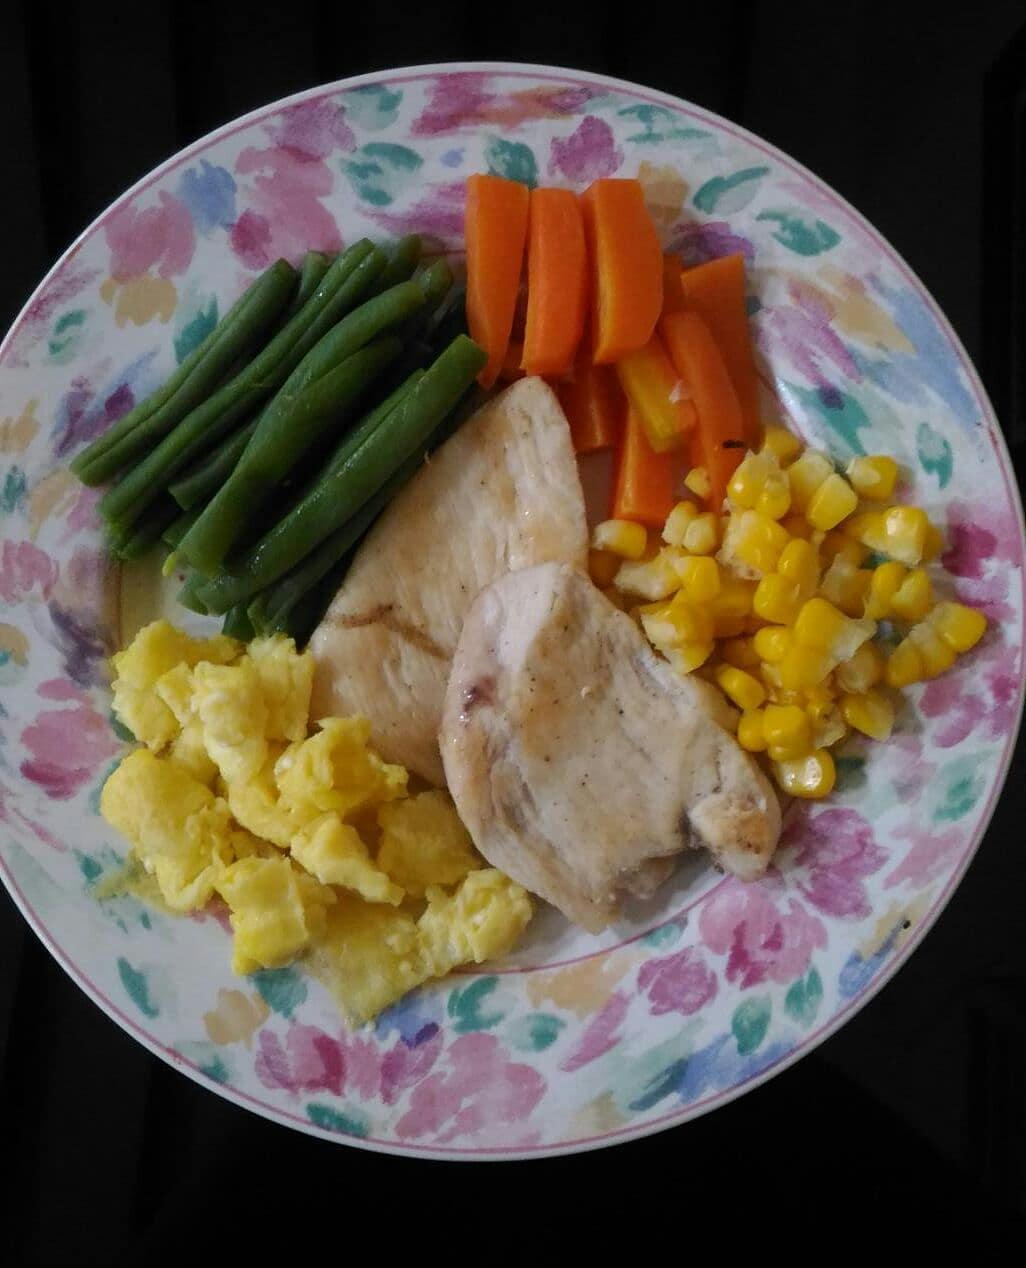 Makan siang yuk bunda-bunda syantiiiik  . . #dietkenyang#dietsehat#dewihughes#re...